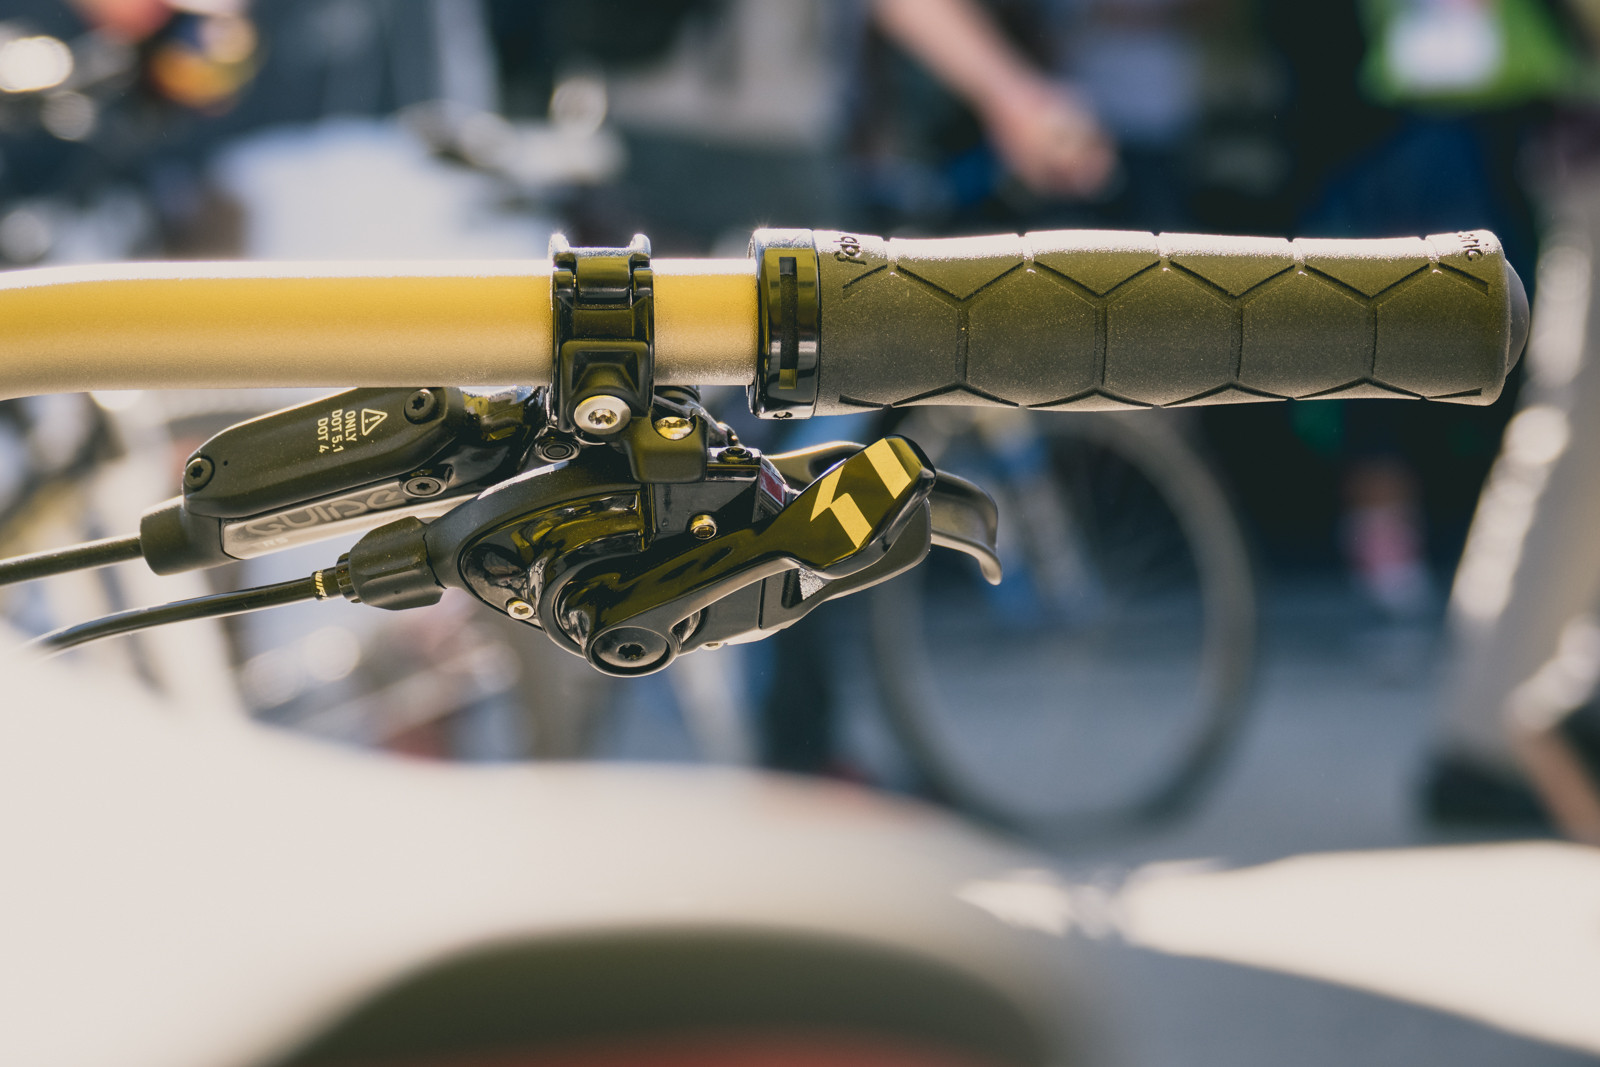 Fabric Semi-Ergo Lock-On Grips - 2016 Sea Otter Classic Pit Bits - Mountain Biking Pictures - Vital MTB